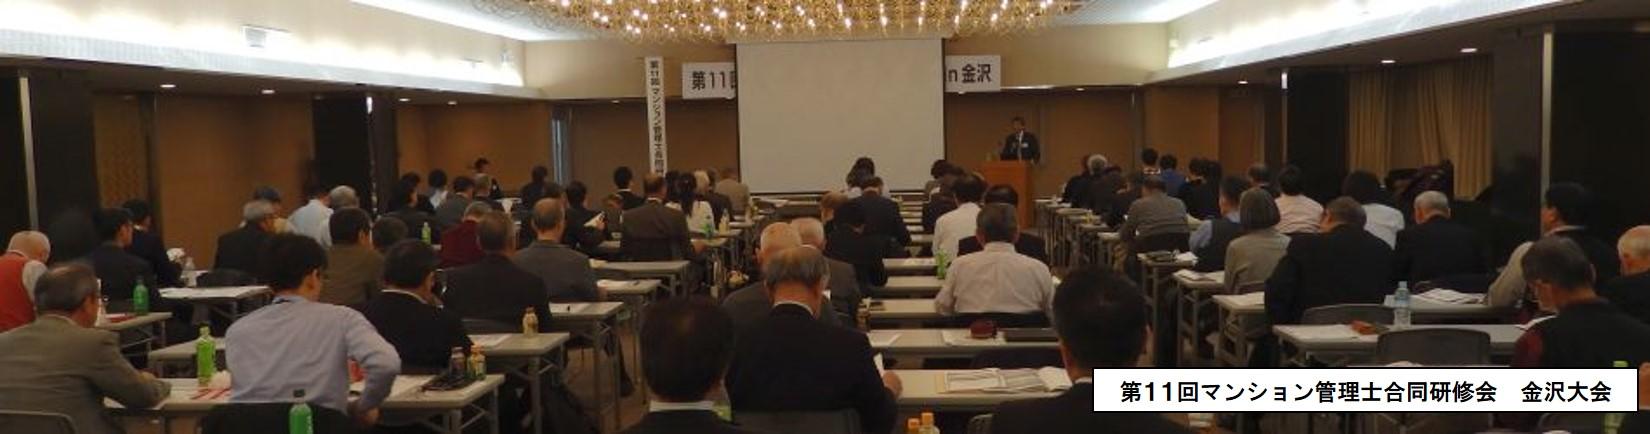 第11回マンション管理士合同研修会 広島大会